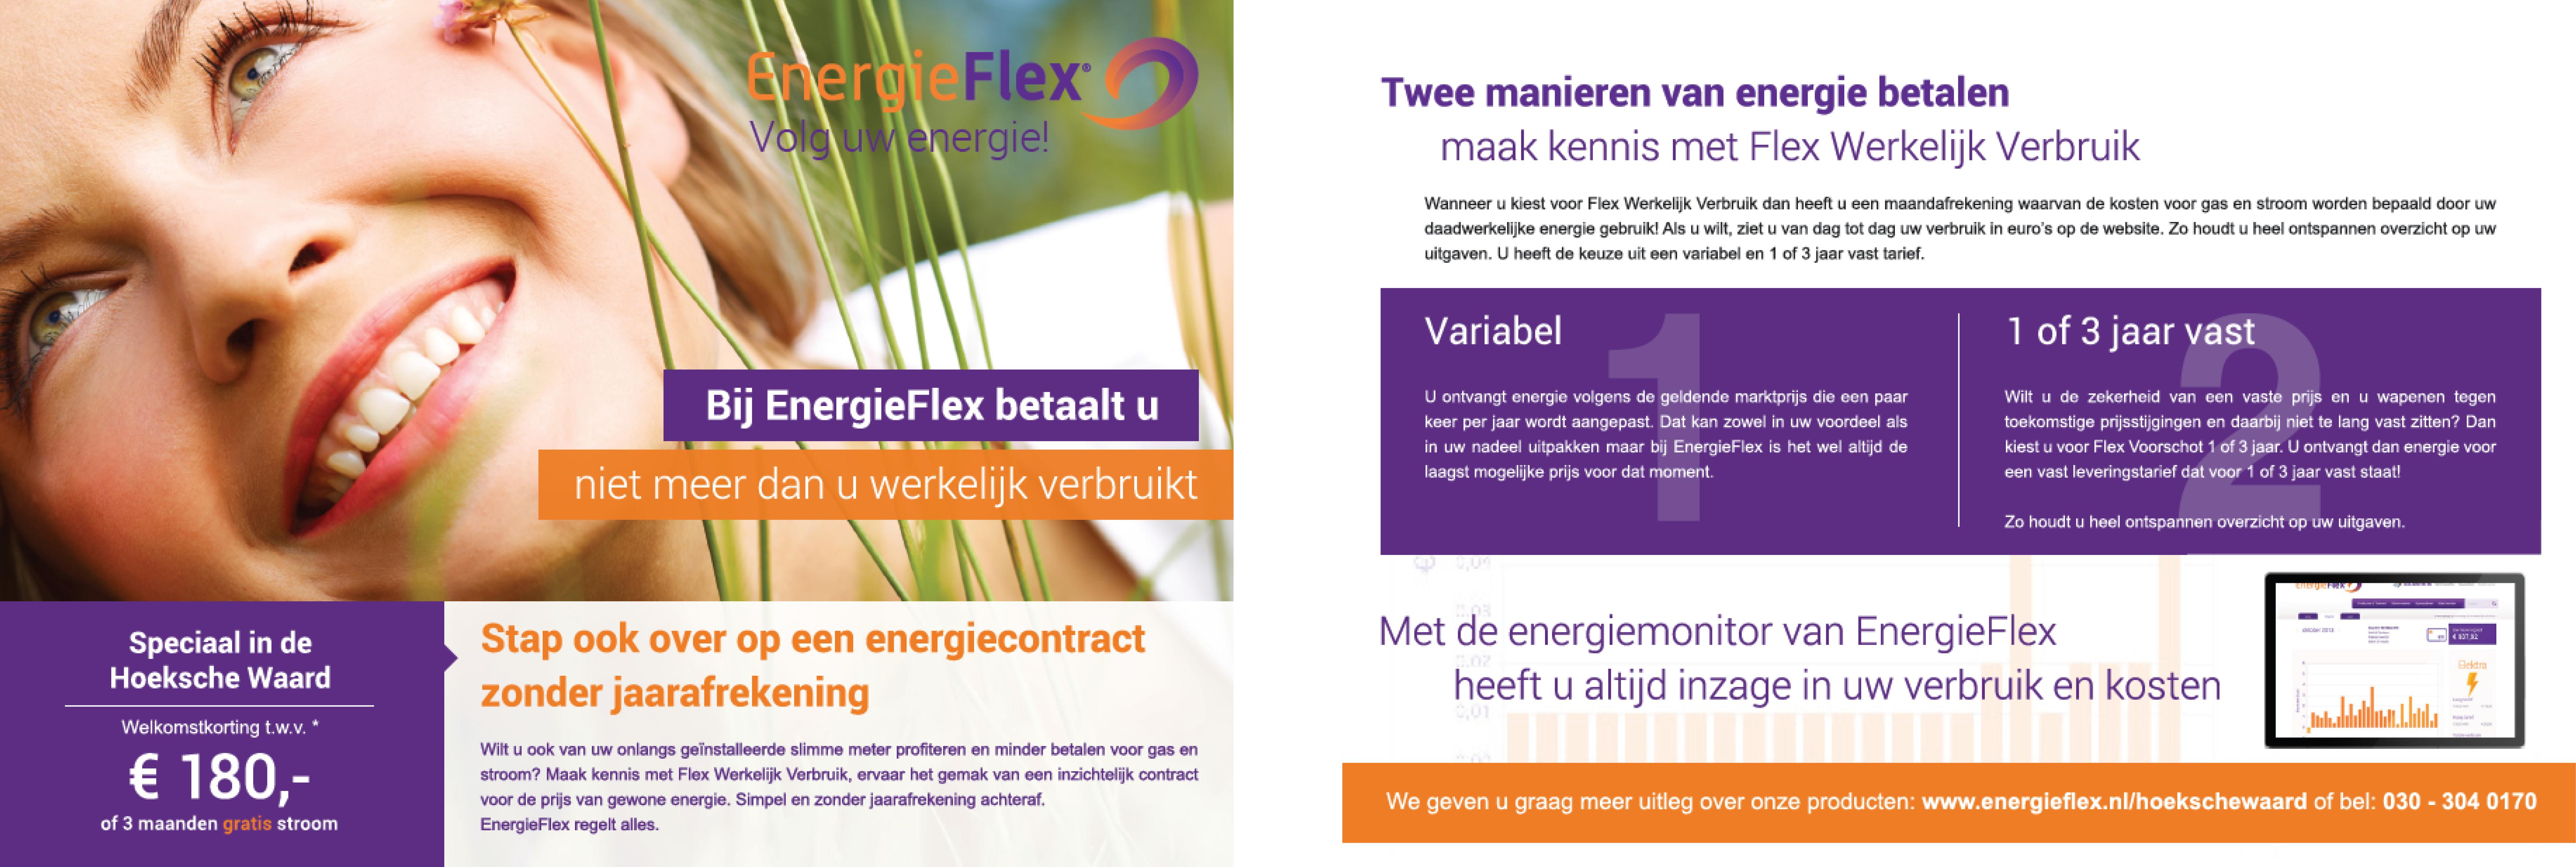 energieflex-image2